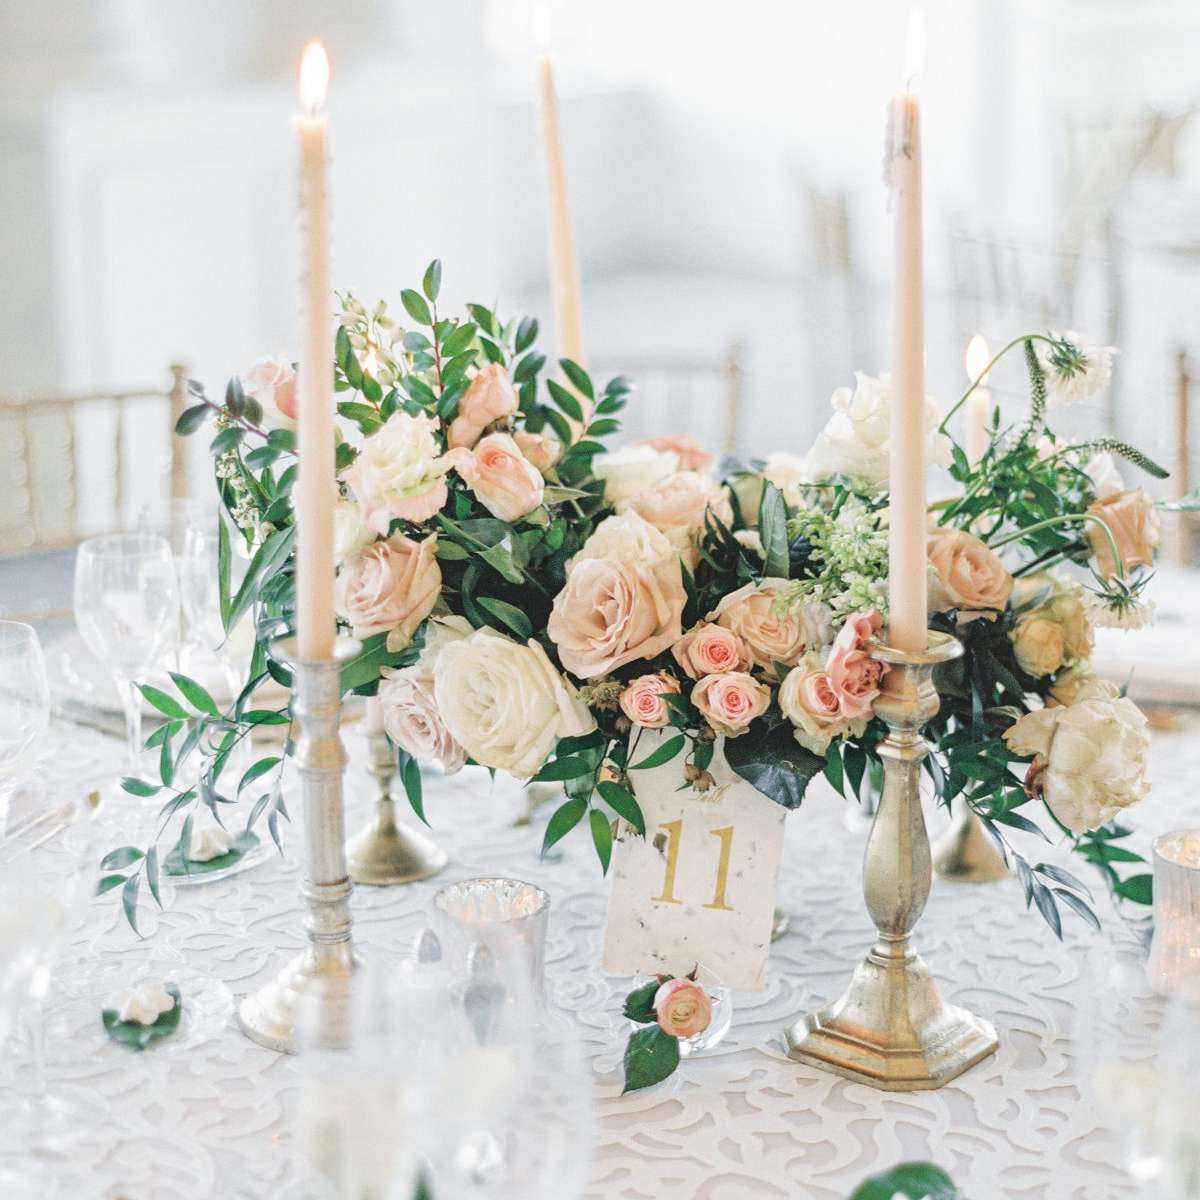 Classic Pink Rose Winter Wedding Centerpiece